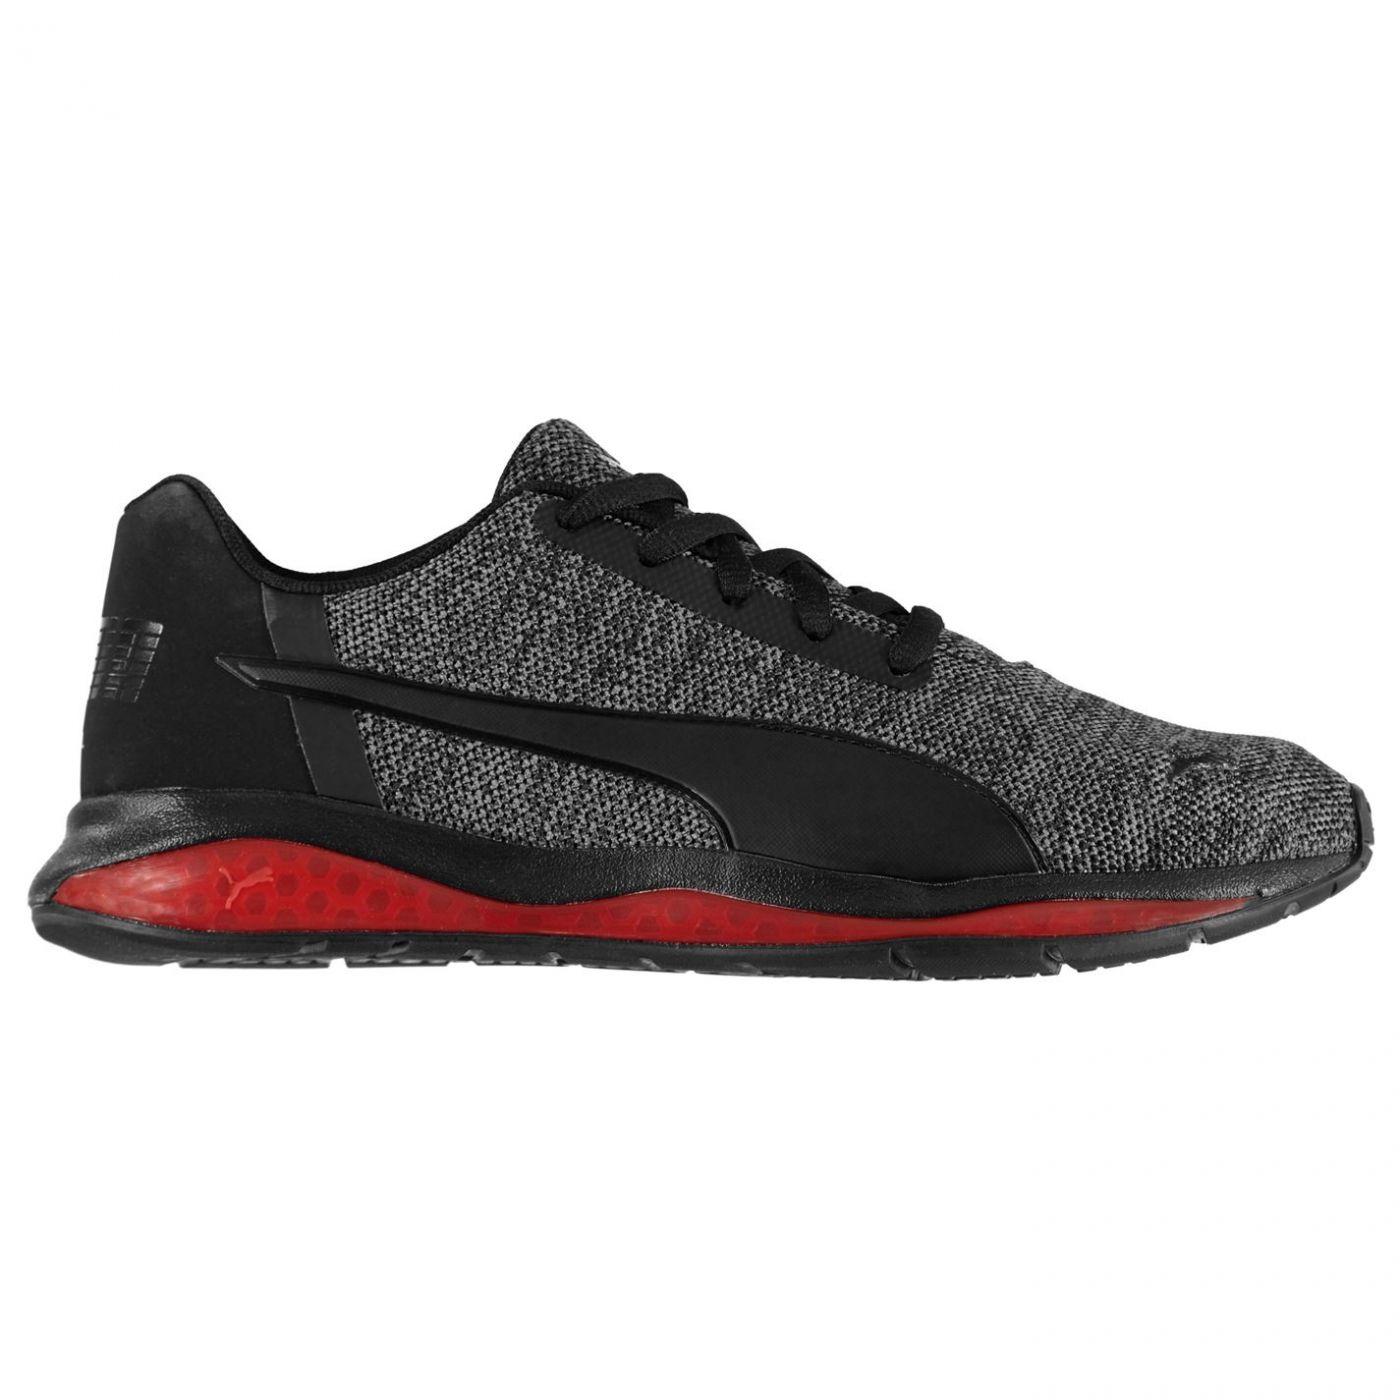 Puma IGNITE Limitless 2 Unrest Men's Running Shoes